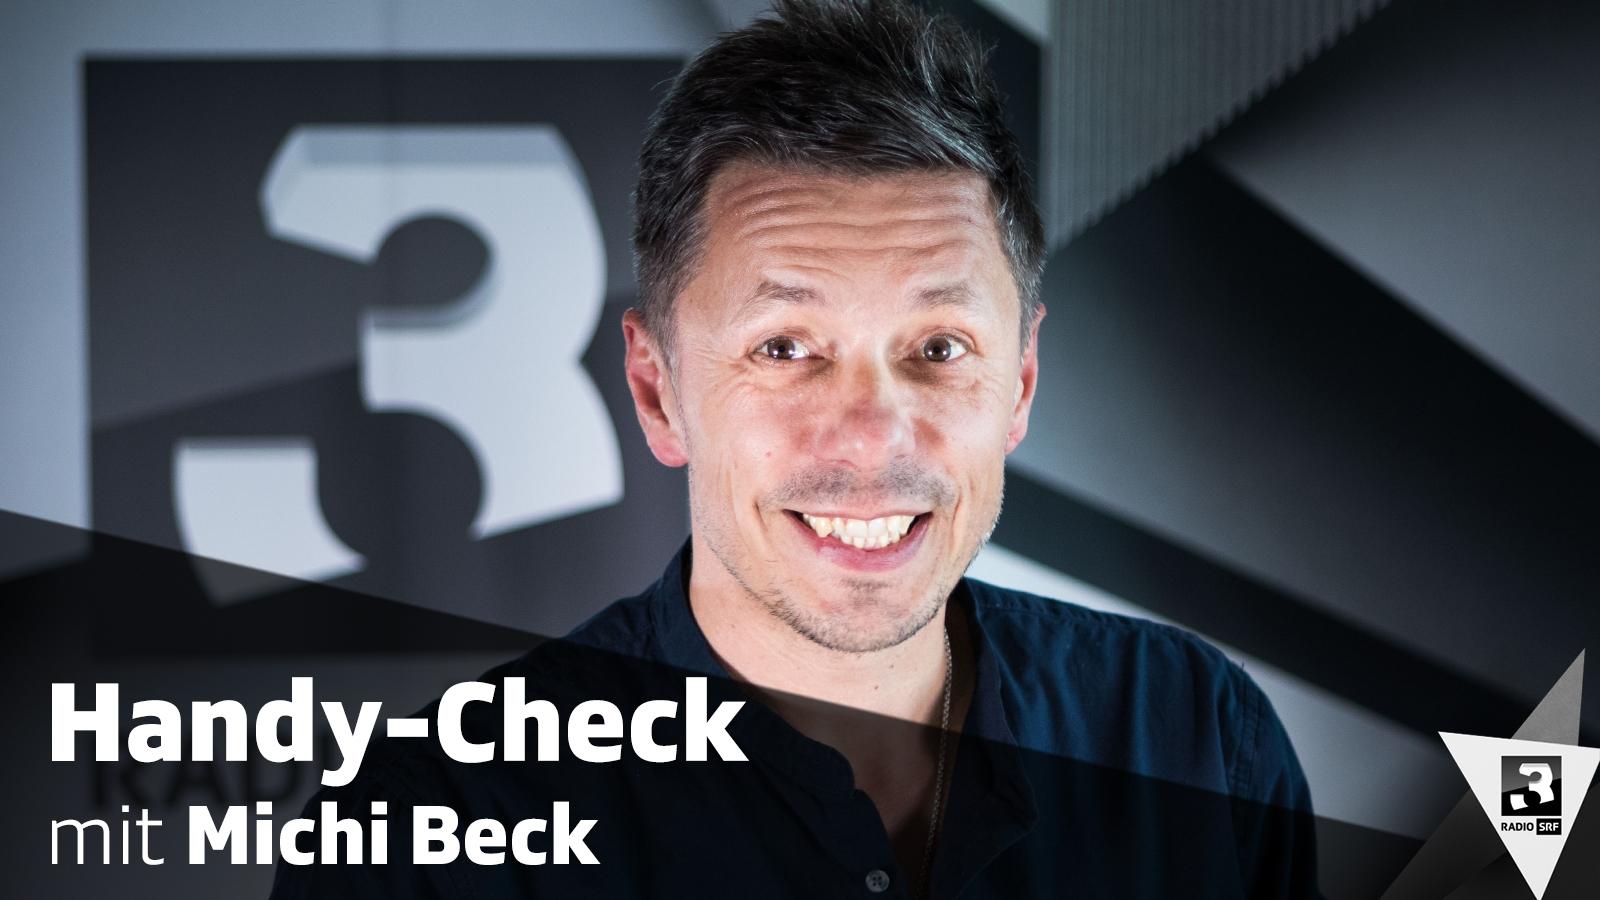 Handy-Check mit Michi Beck